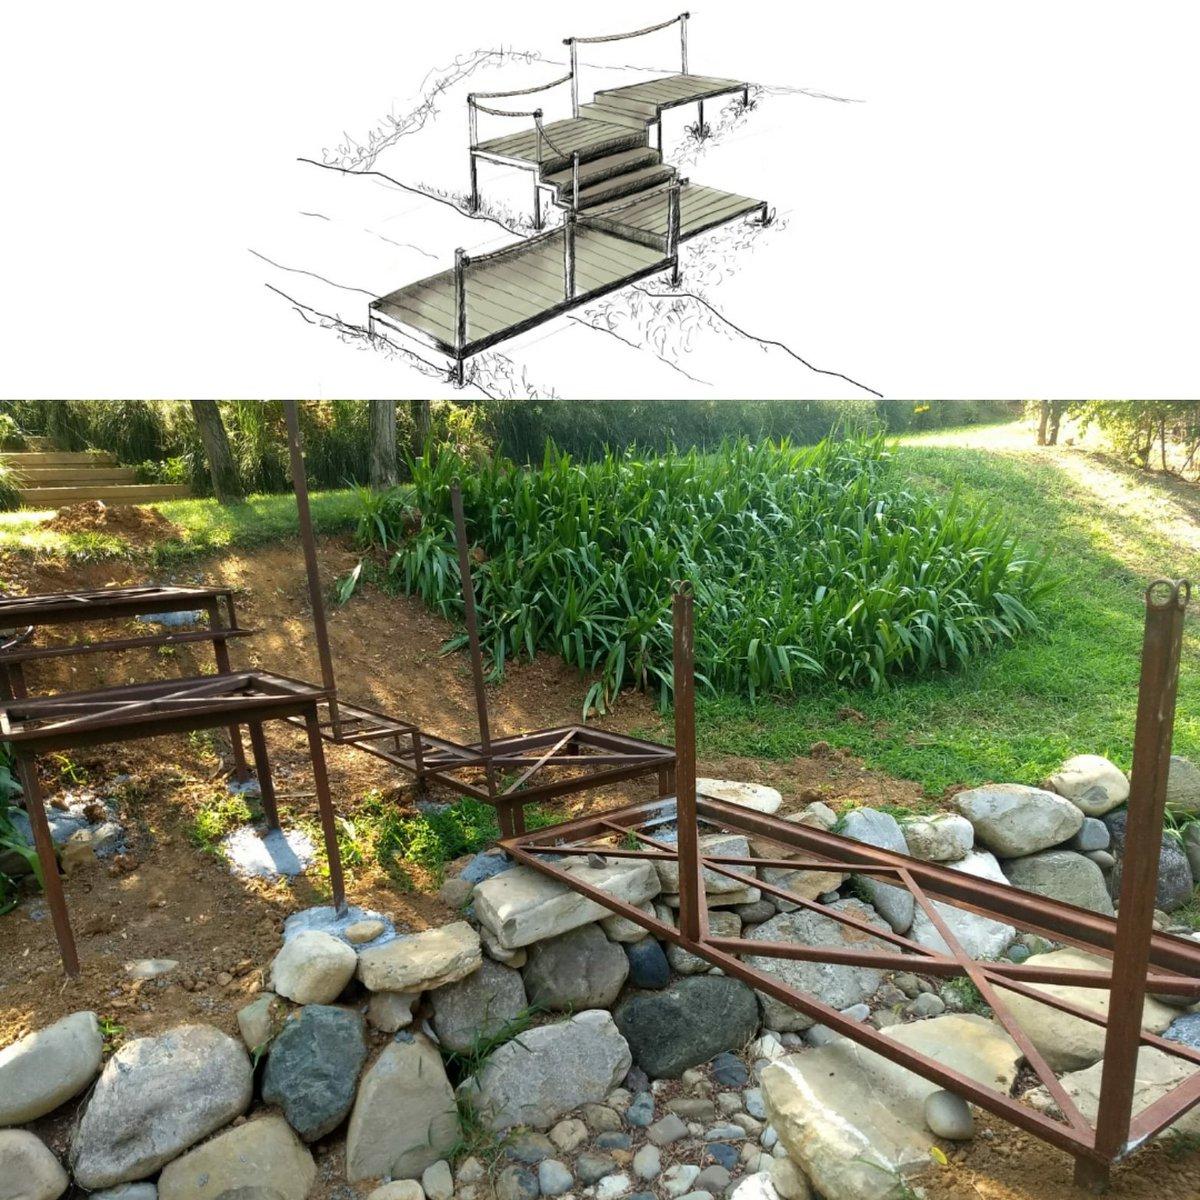 Dalla carta al fabbro per un #giardino su misura! #follow  https:// www.instagram.com/p/Bma_-ASFnT7/?utm_source=ig_share_sheet&igshid=17g6atzqhfmit#bearesigiardini #gardener #gardendesign #landscape #structure #outdoor #Piacenza #italy  - Ukustom